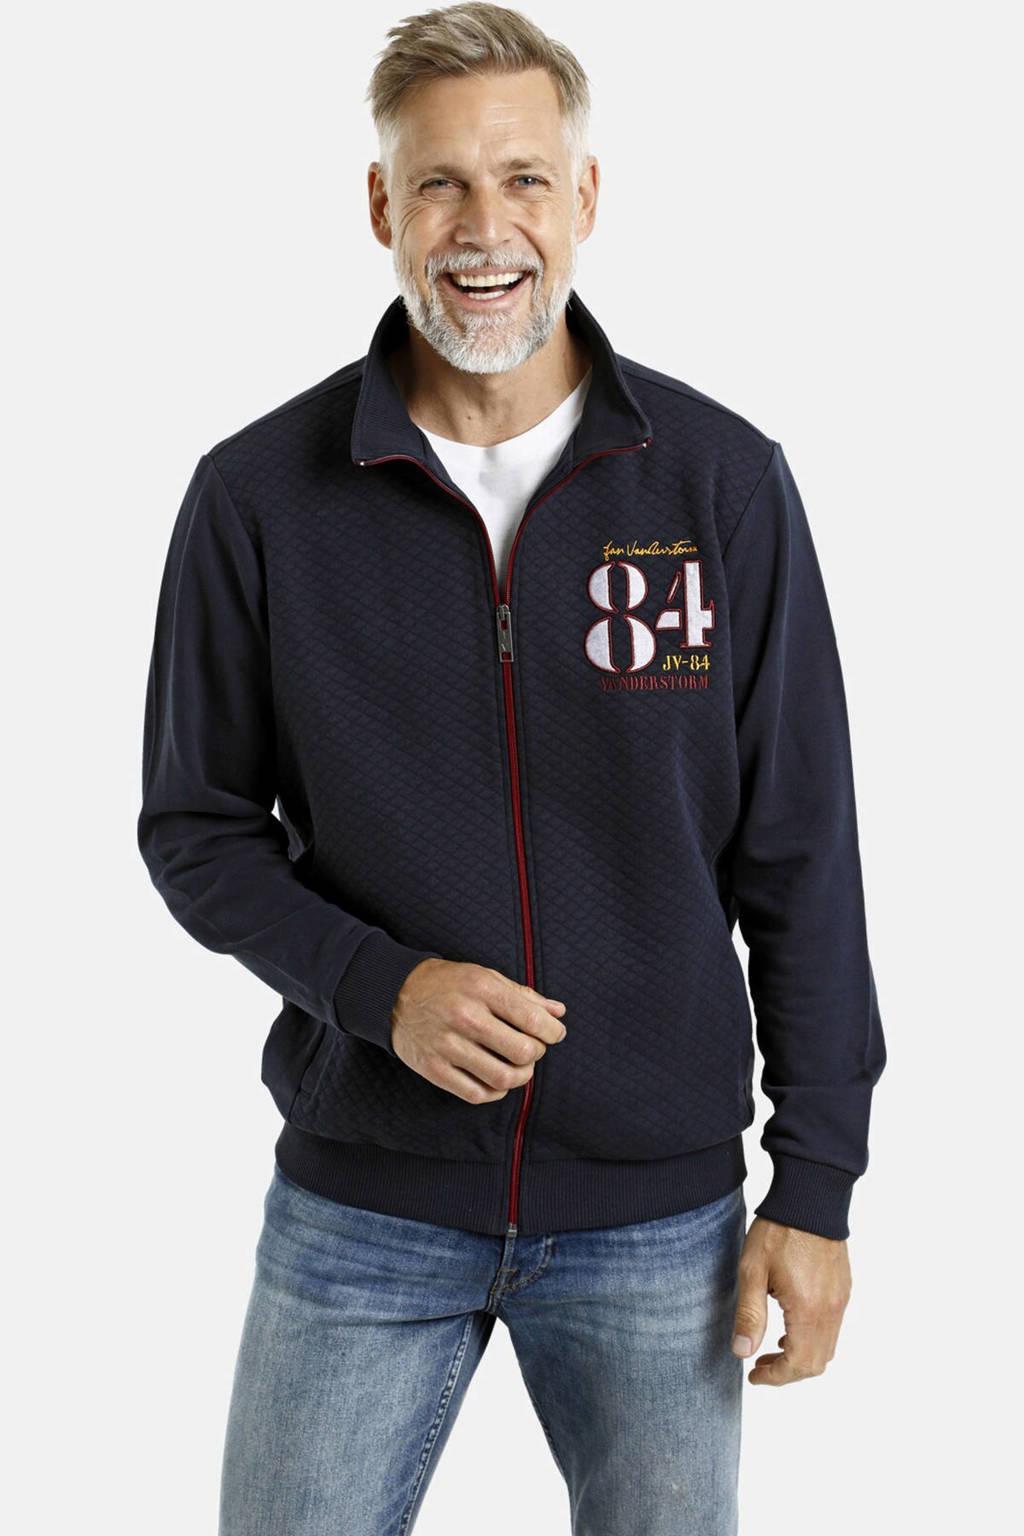 Jan Vanderstorm vest Plus Size Plus Size donkerblauw, Donkerblauw